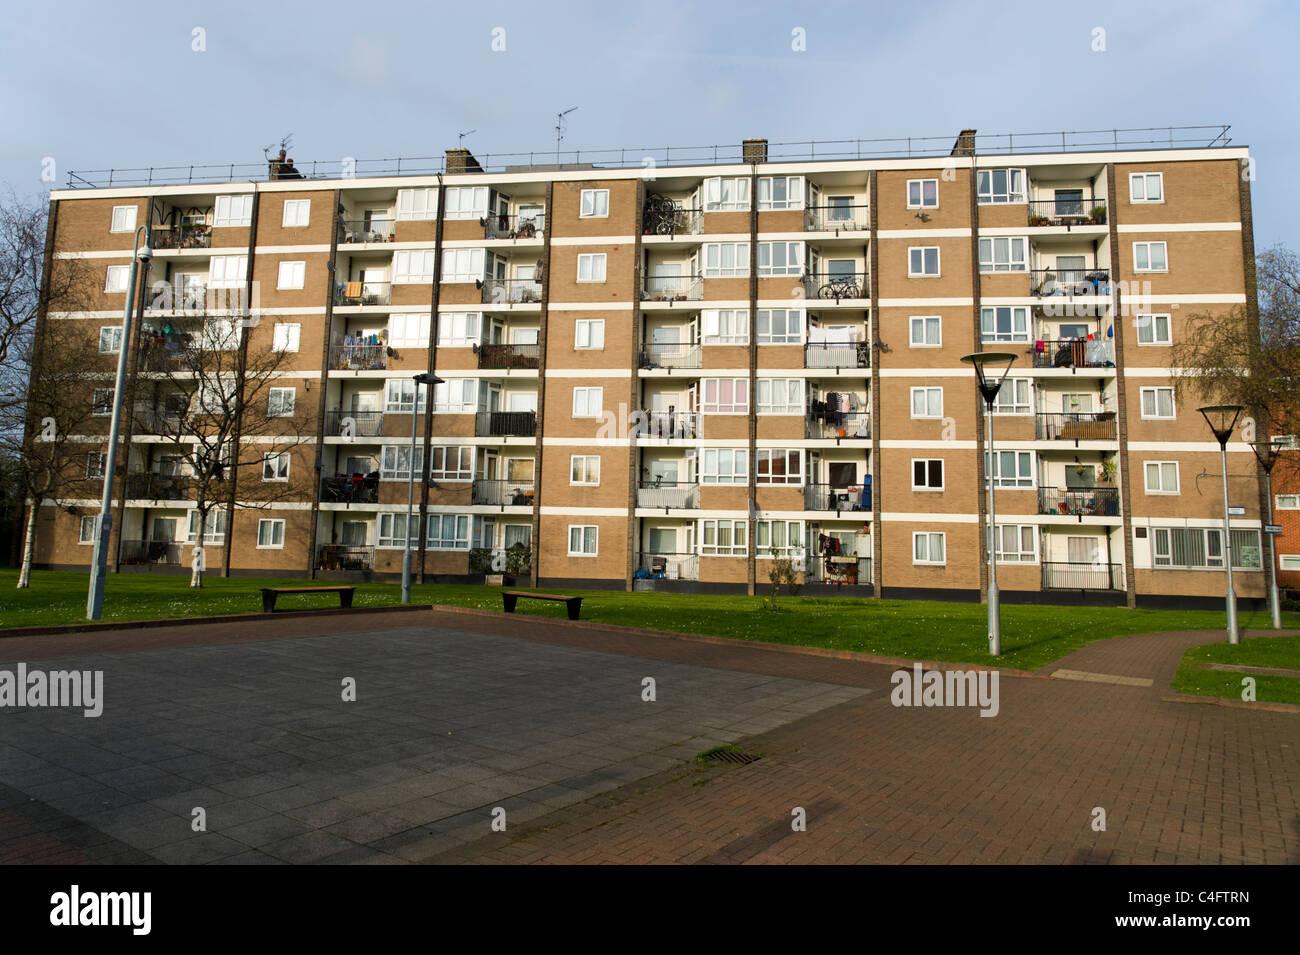 Block of council flats, Hackney, London, UK - Stock Image